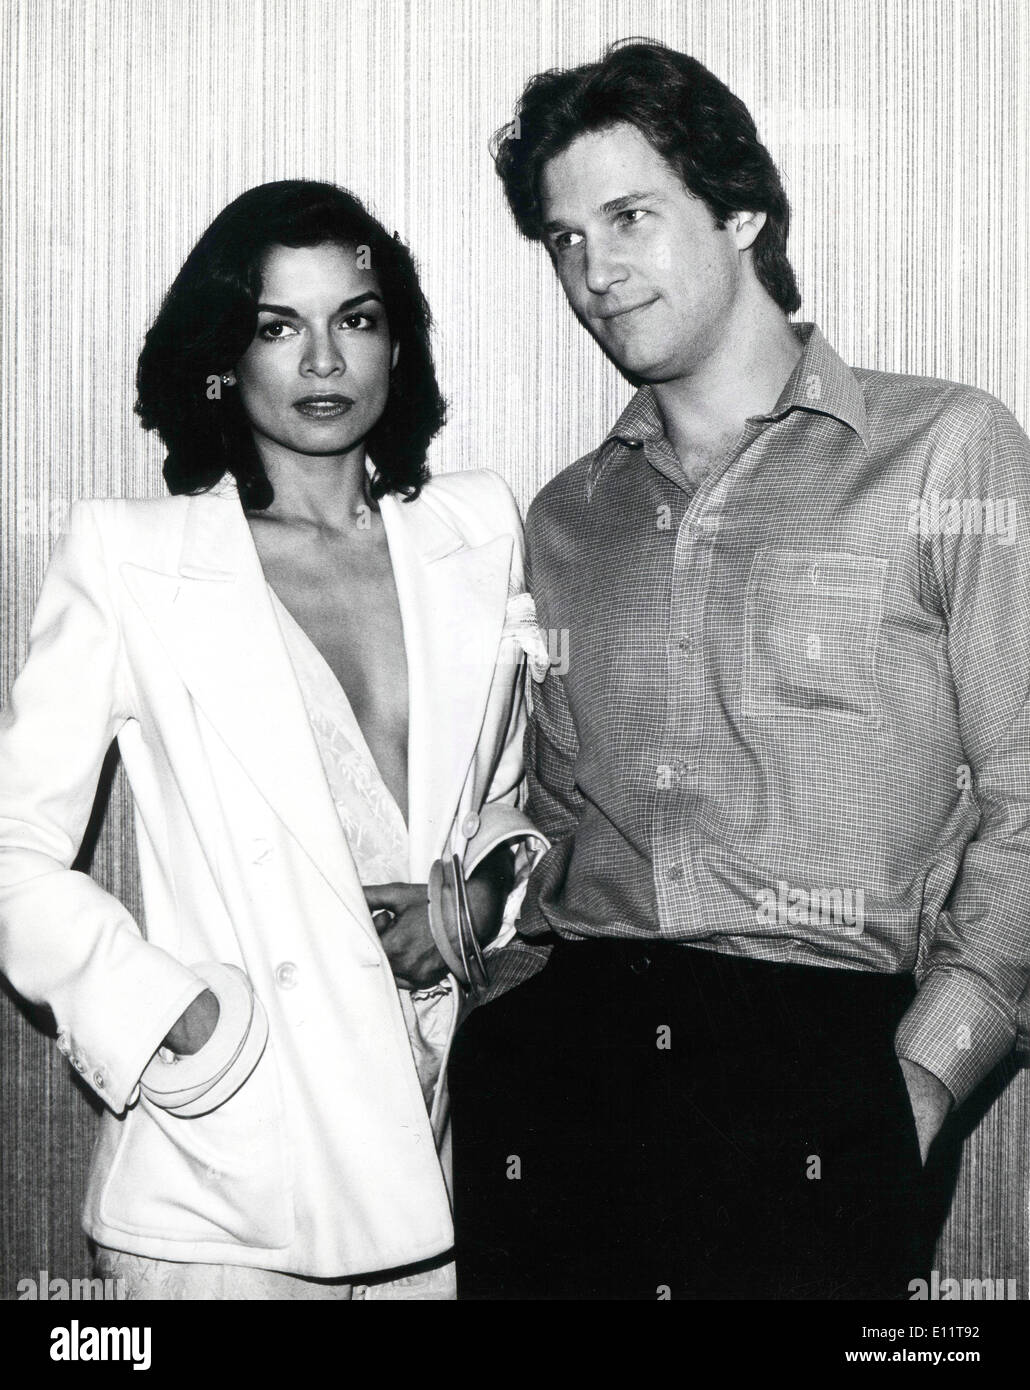 Actress Bianca Jagger with co-star Jeff Bridges - Stock Image